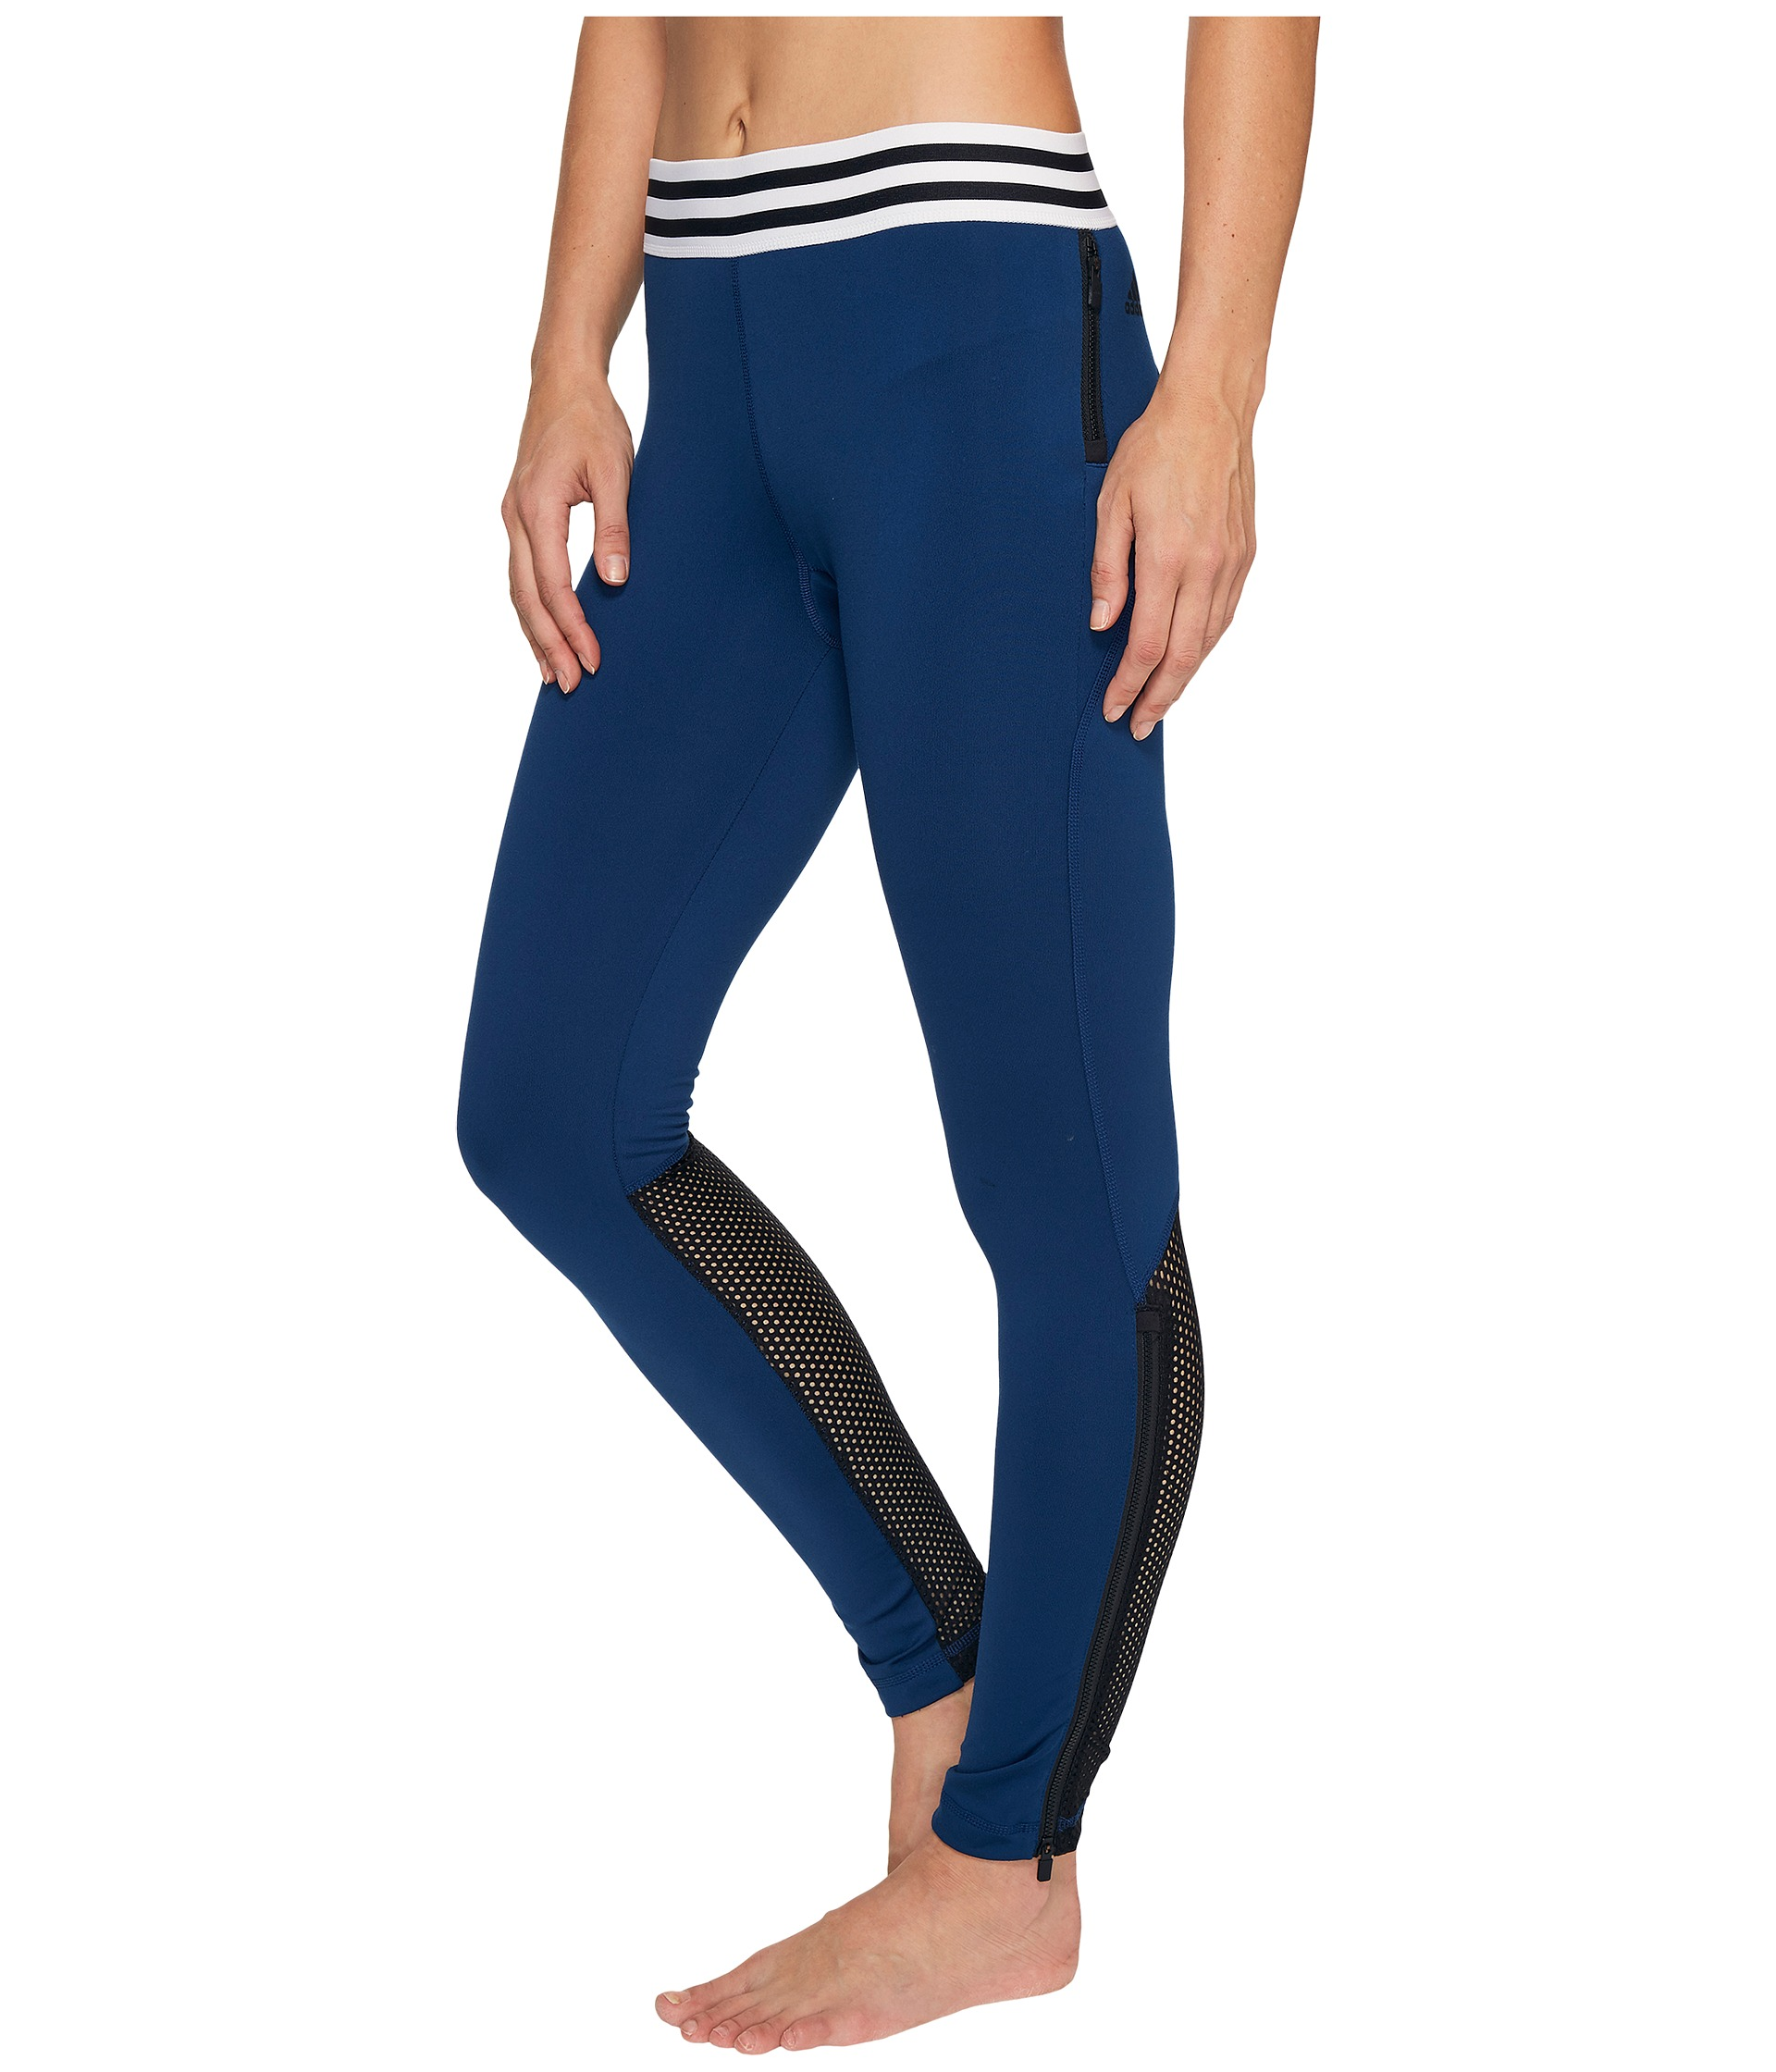 adidas sport id zipper leggings free shipping both ways. Black Bedroom Furniture Sets. Home Design Ideas